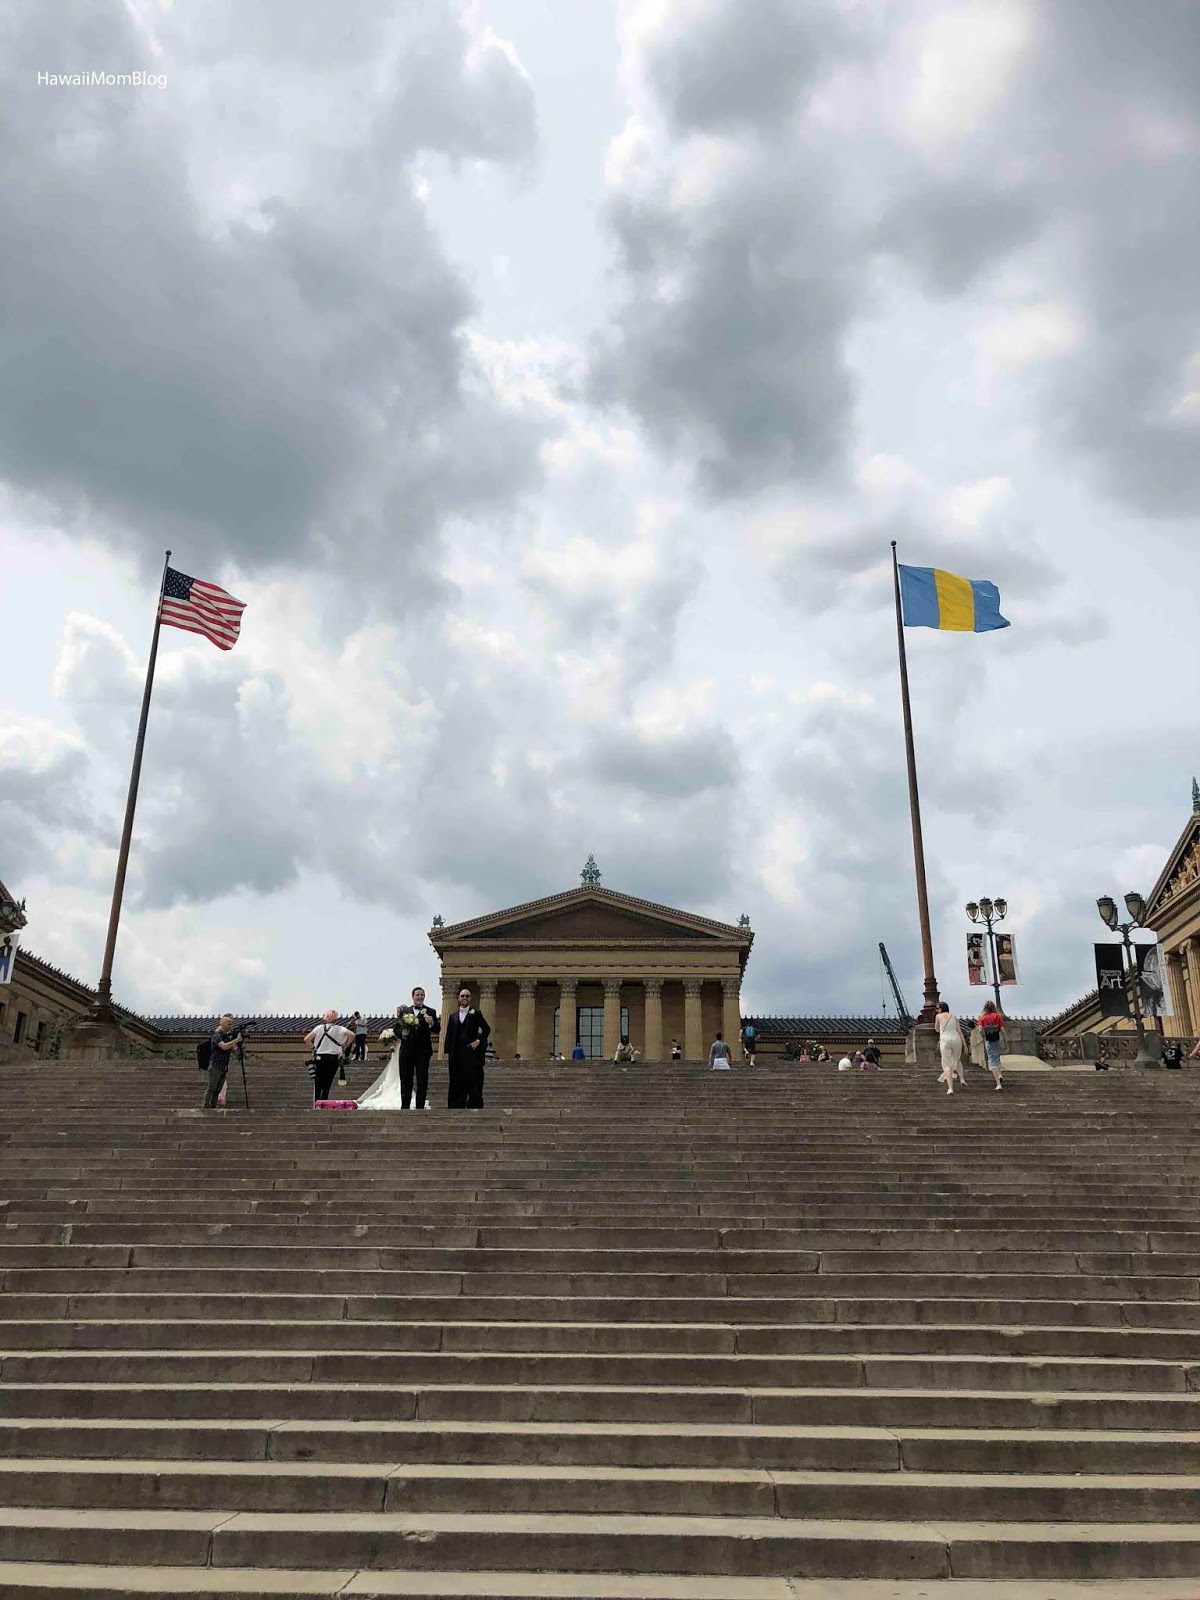 Hawaii Mom Blog: Visit Philadelphia: Rocky Steps